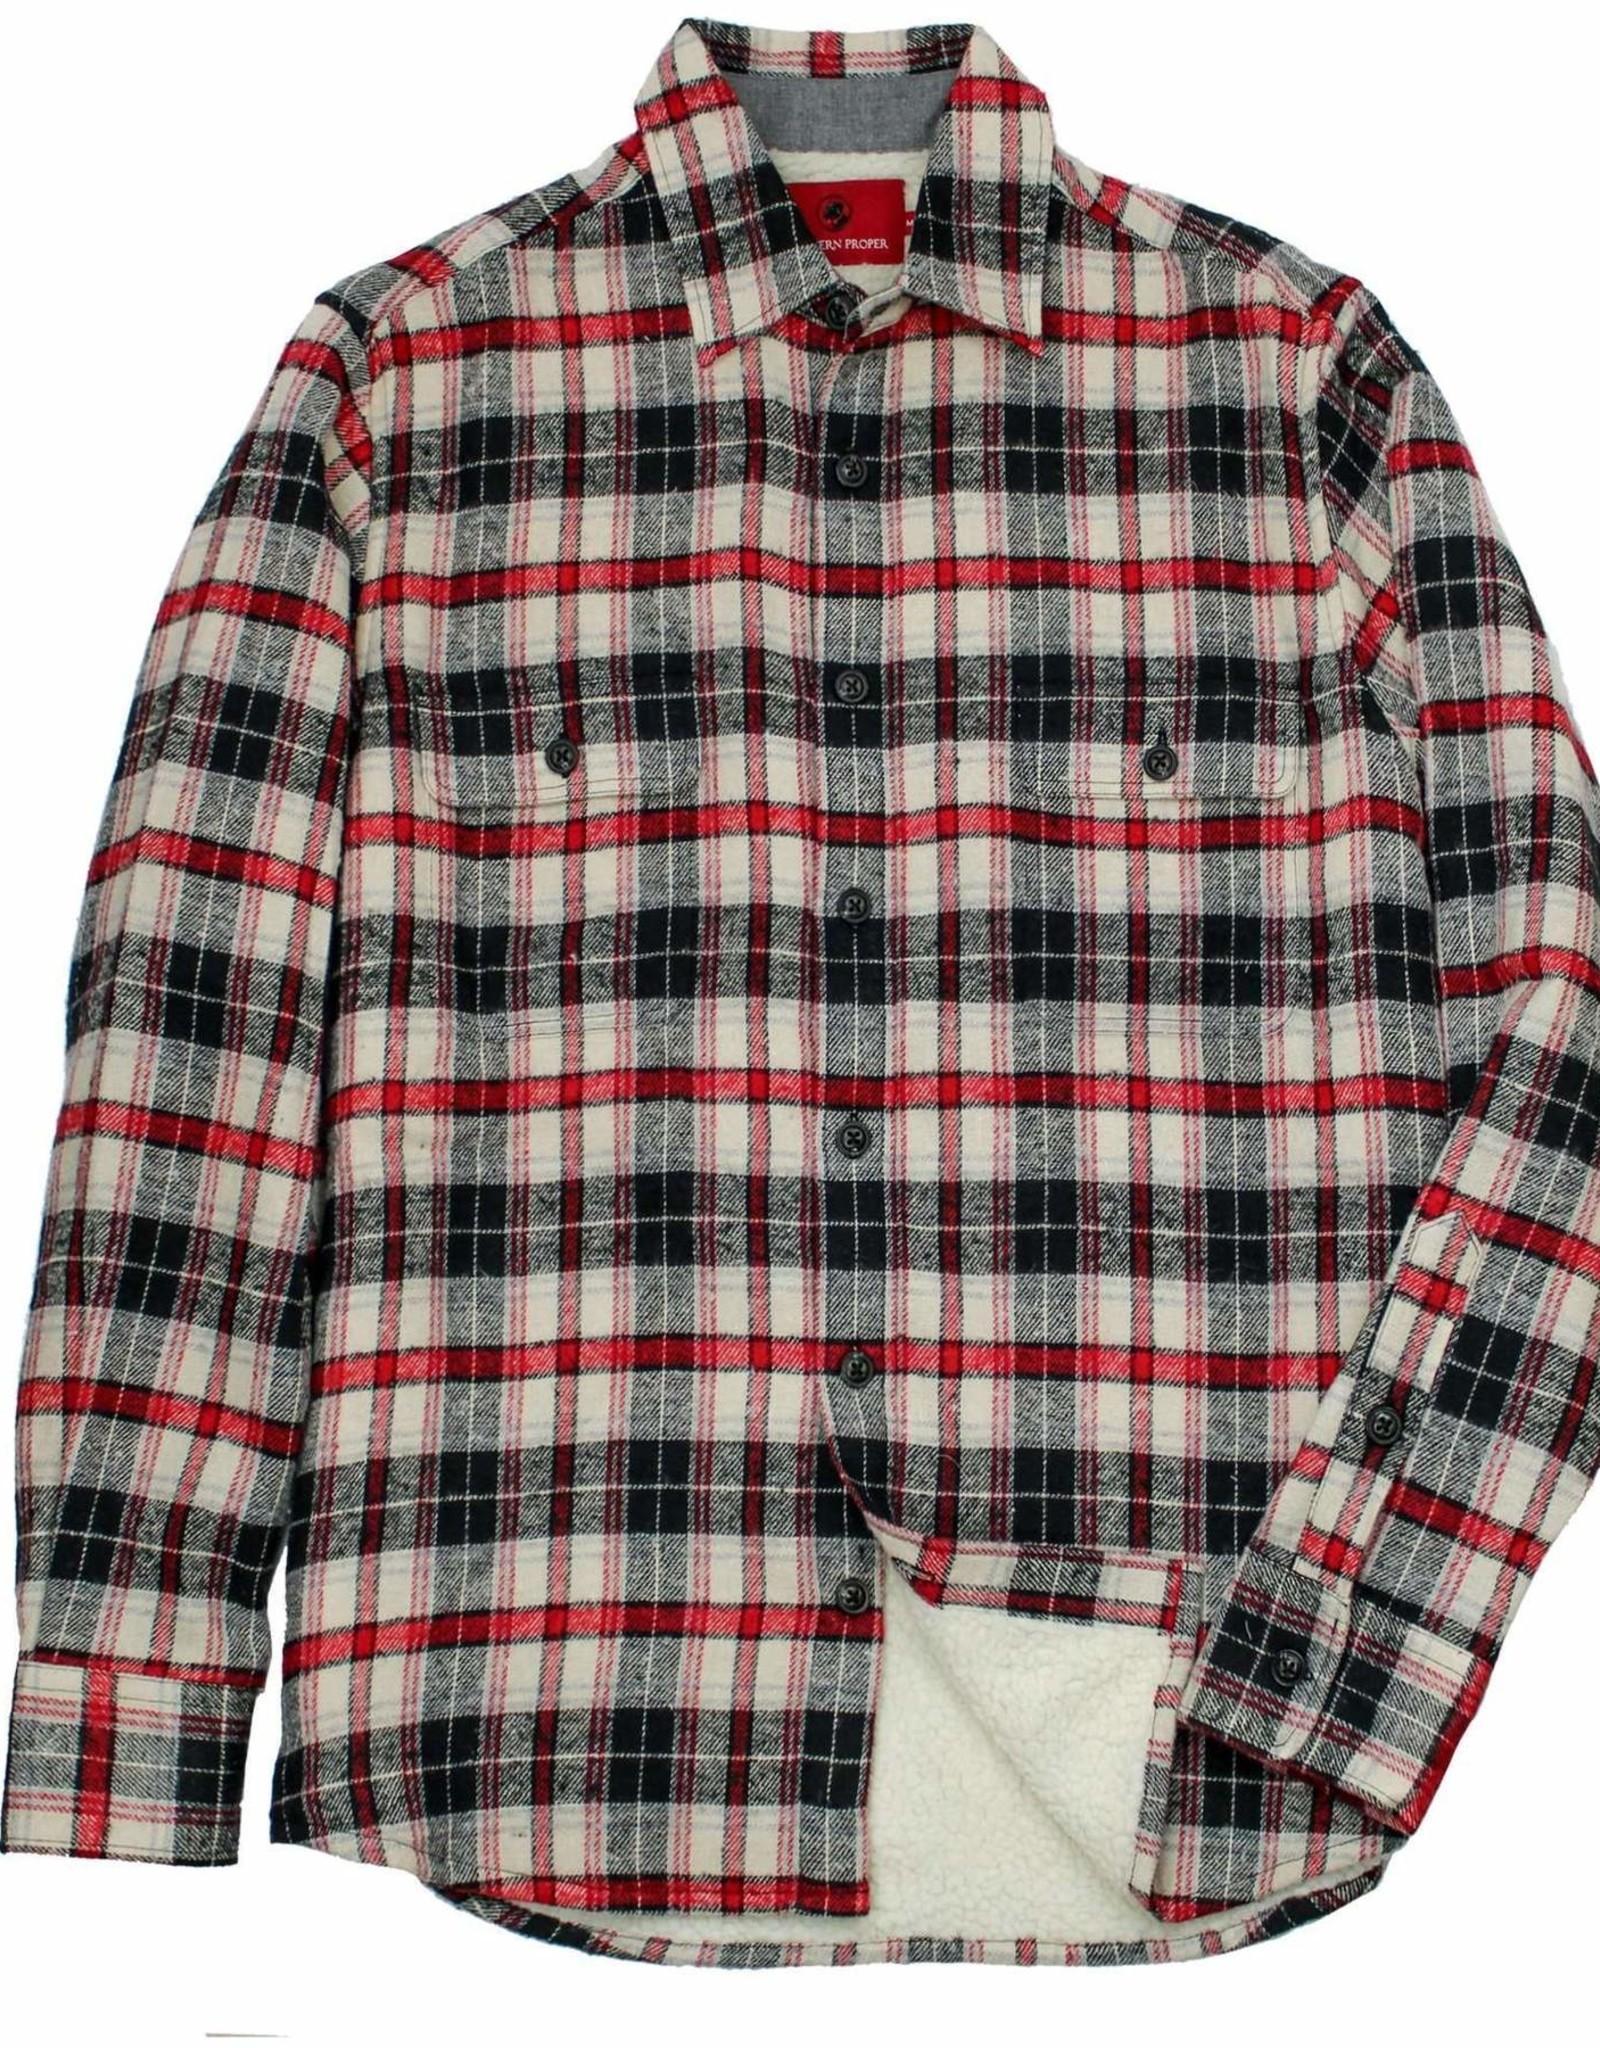 Southern Proper Shirt Jacket